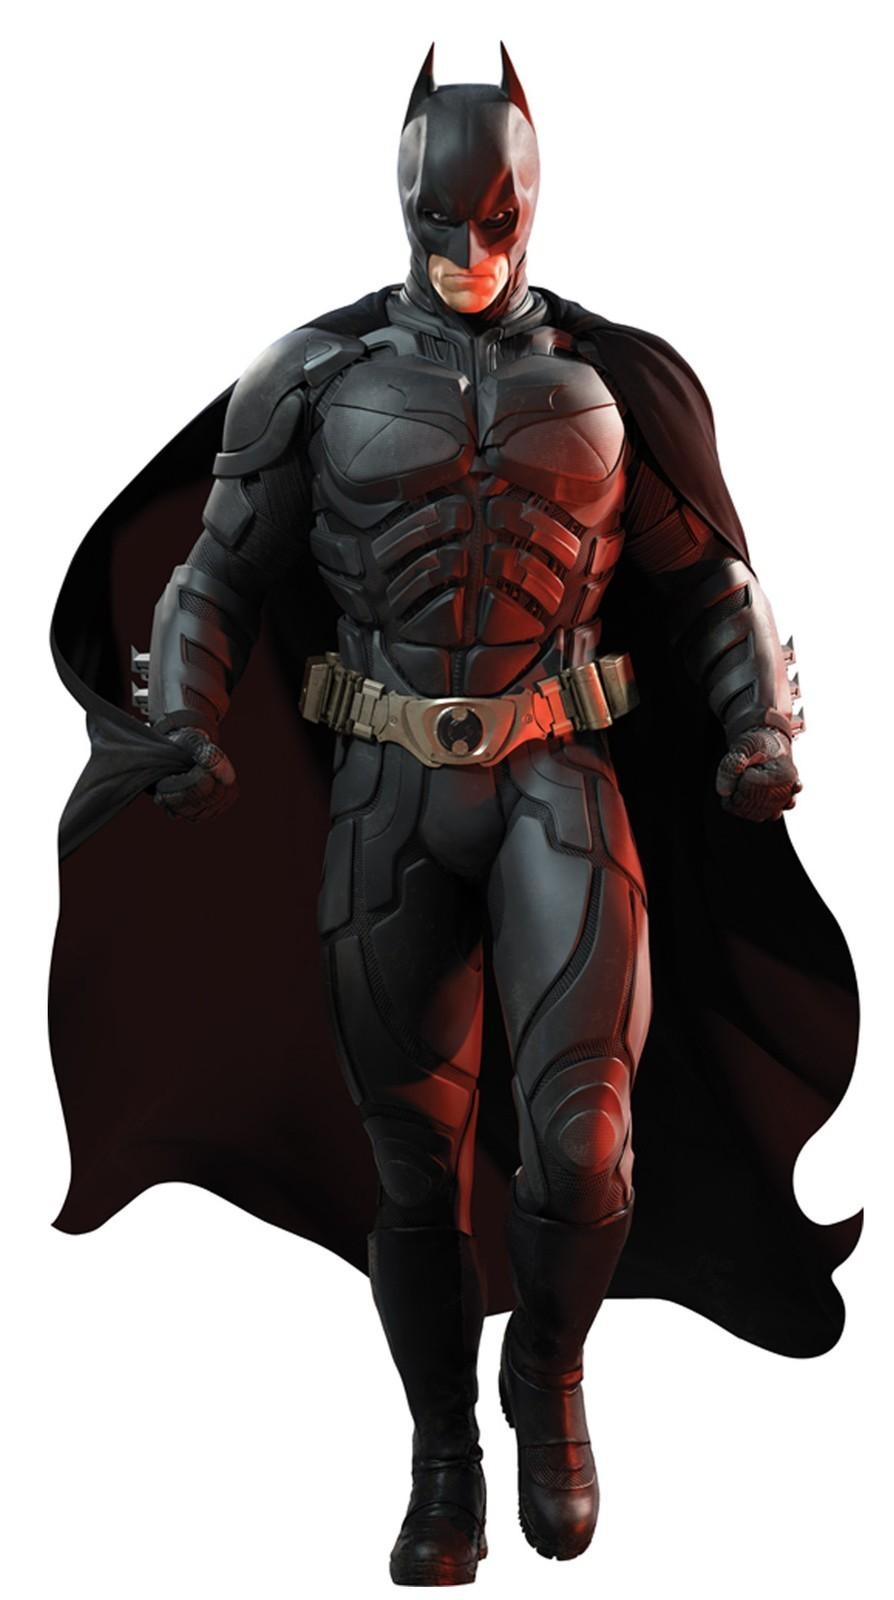 http://images5.fanpop.com/image/photos/30400000/Batman-Promo-Art-the-dark-knight-rises-30442161-894-1600.jpg